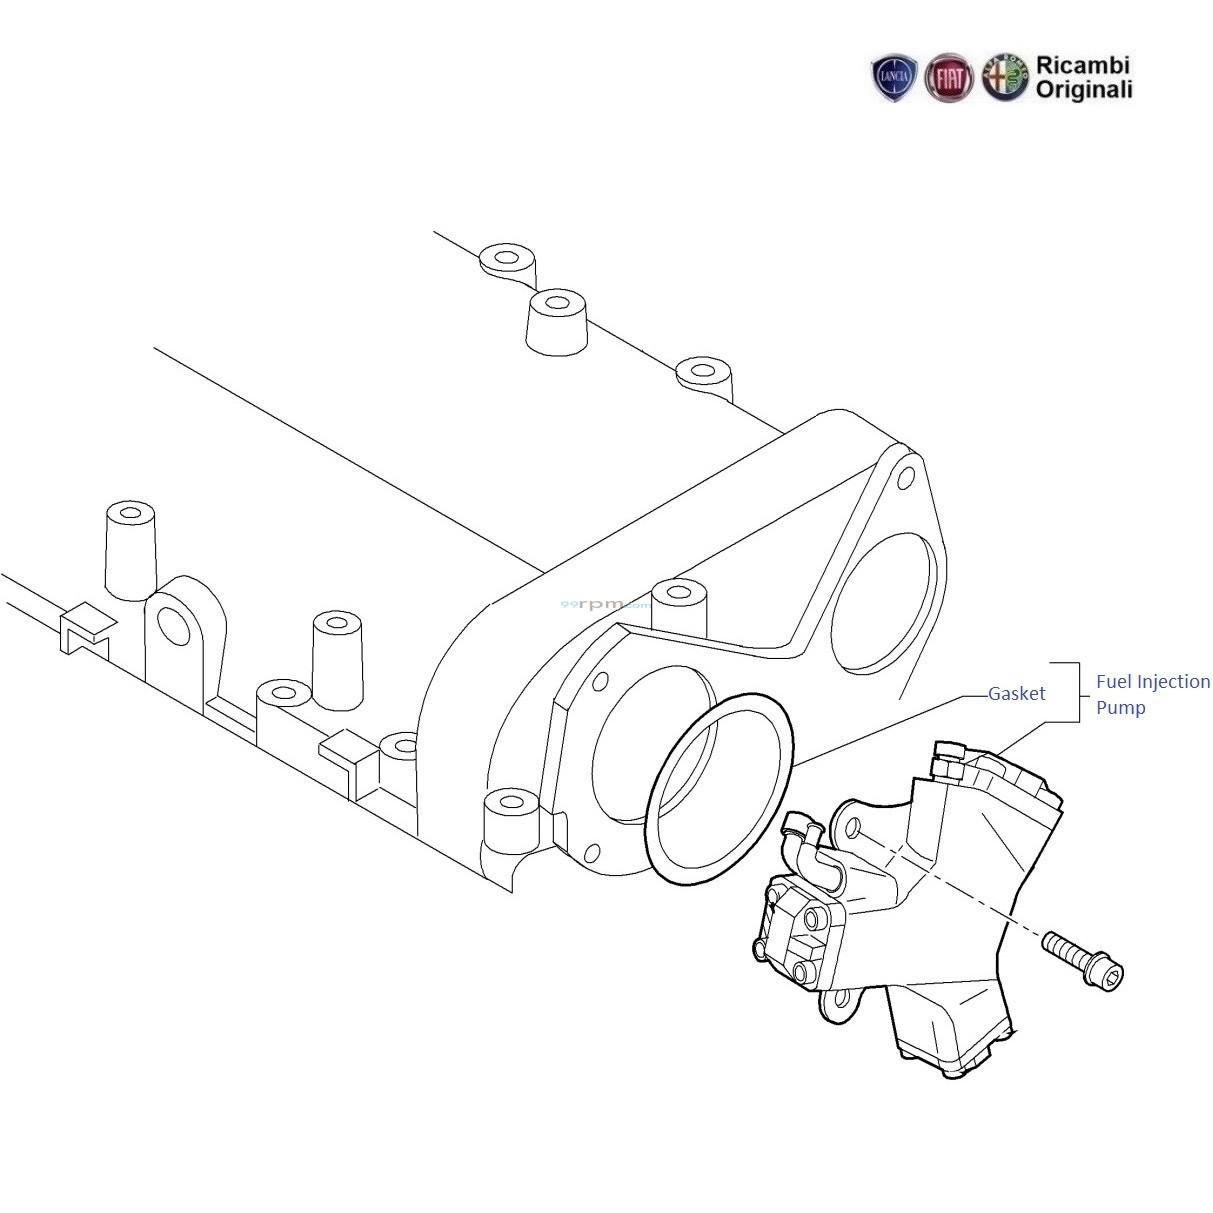 fiat fuel pump diagram wiring library  fiat punto 1 3 mjd diesel fuel injection pump